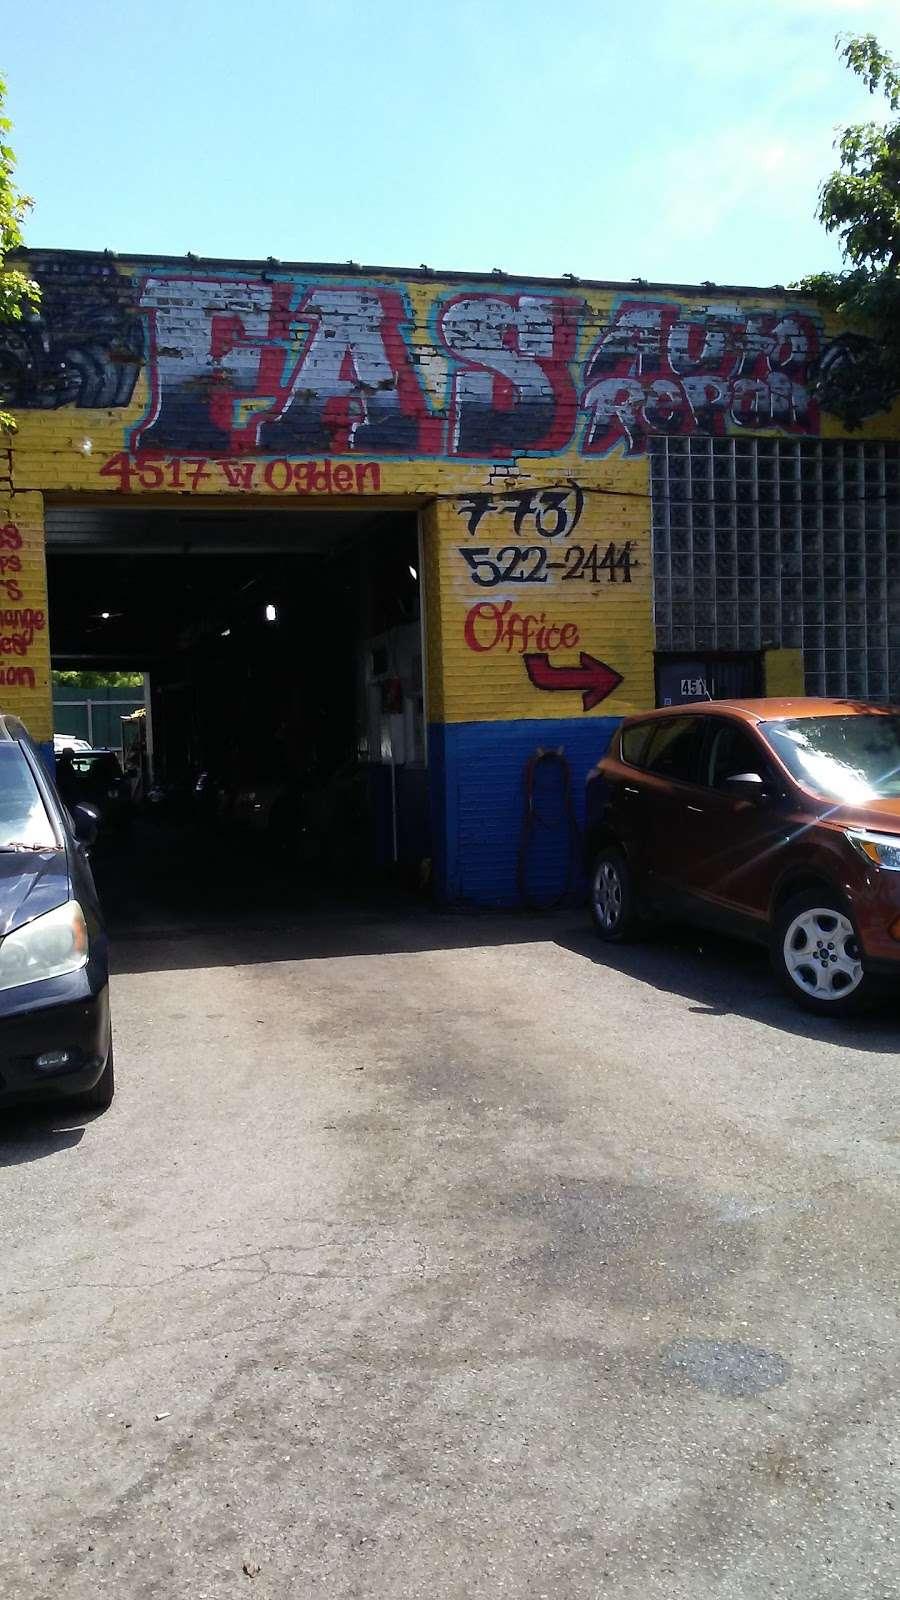 Fas Auto Repair - car repair  | Photo 2 of 7 | Address: 4517 Ogden Ave, Chicago, IL 60623, USA | Phone: (773) 522-2444